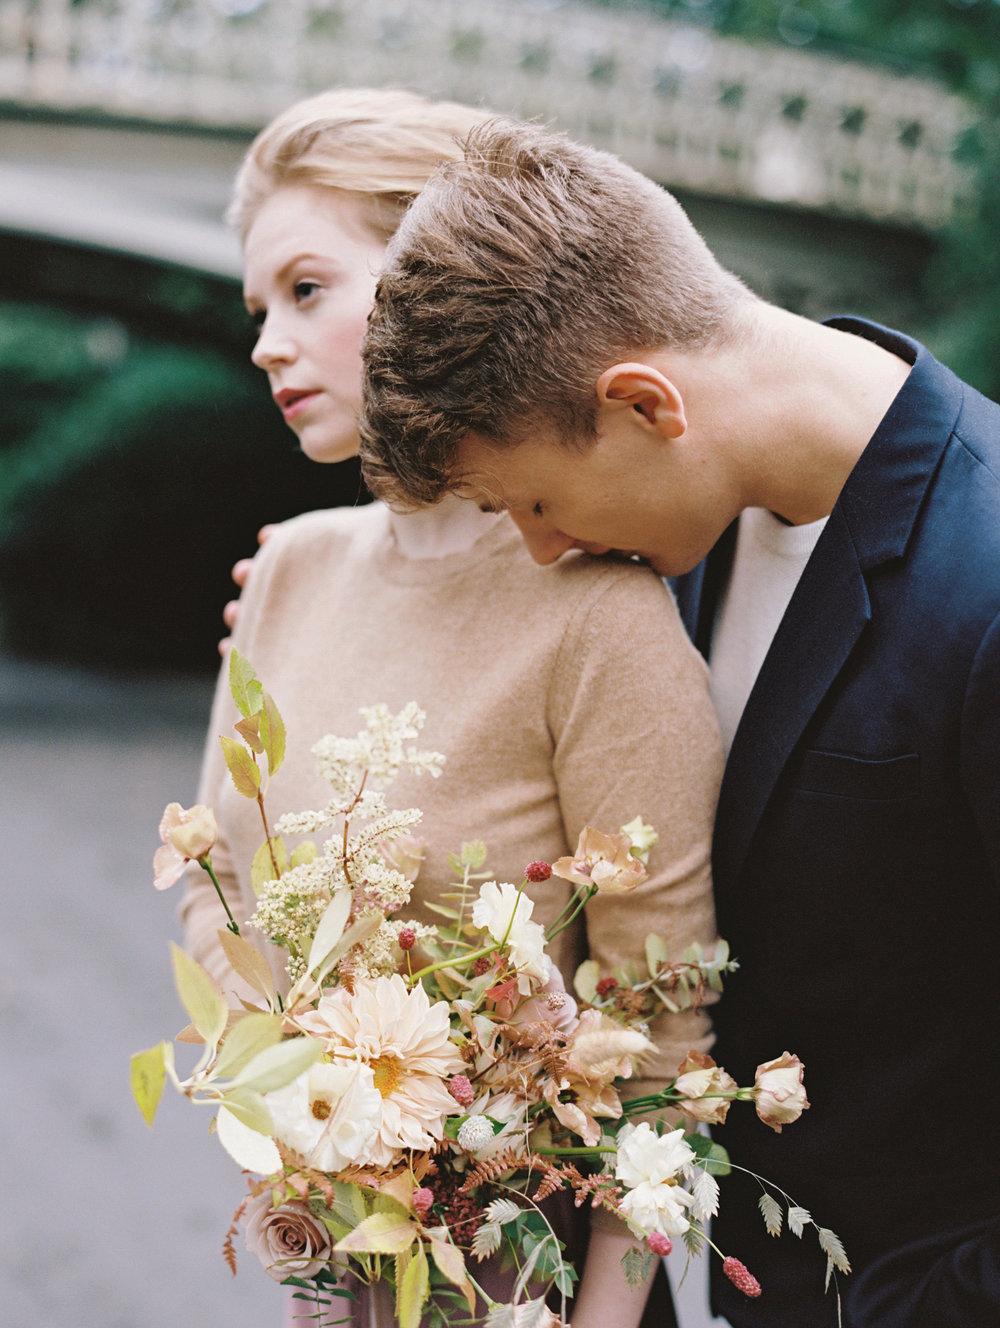 kelsandmichael_bridaleditorial_harvestelopement-32.jpg